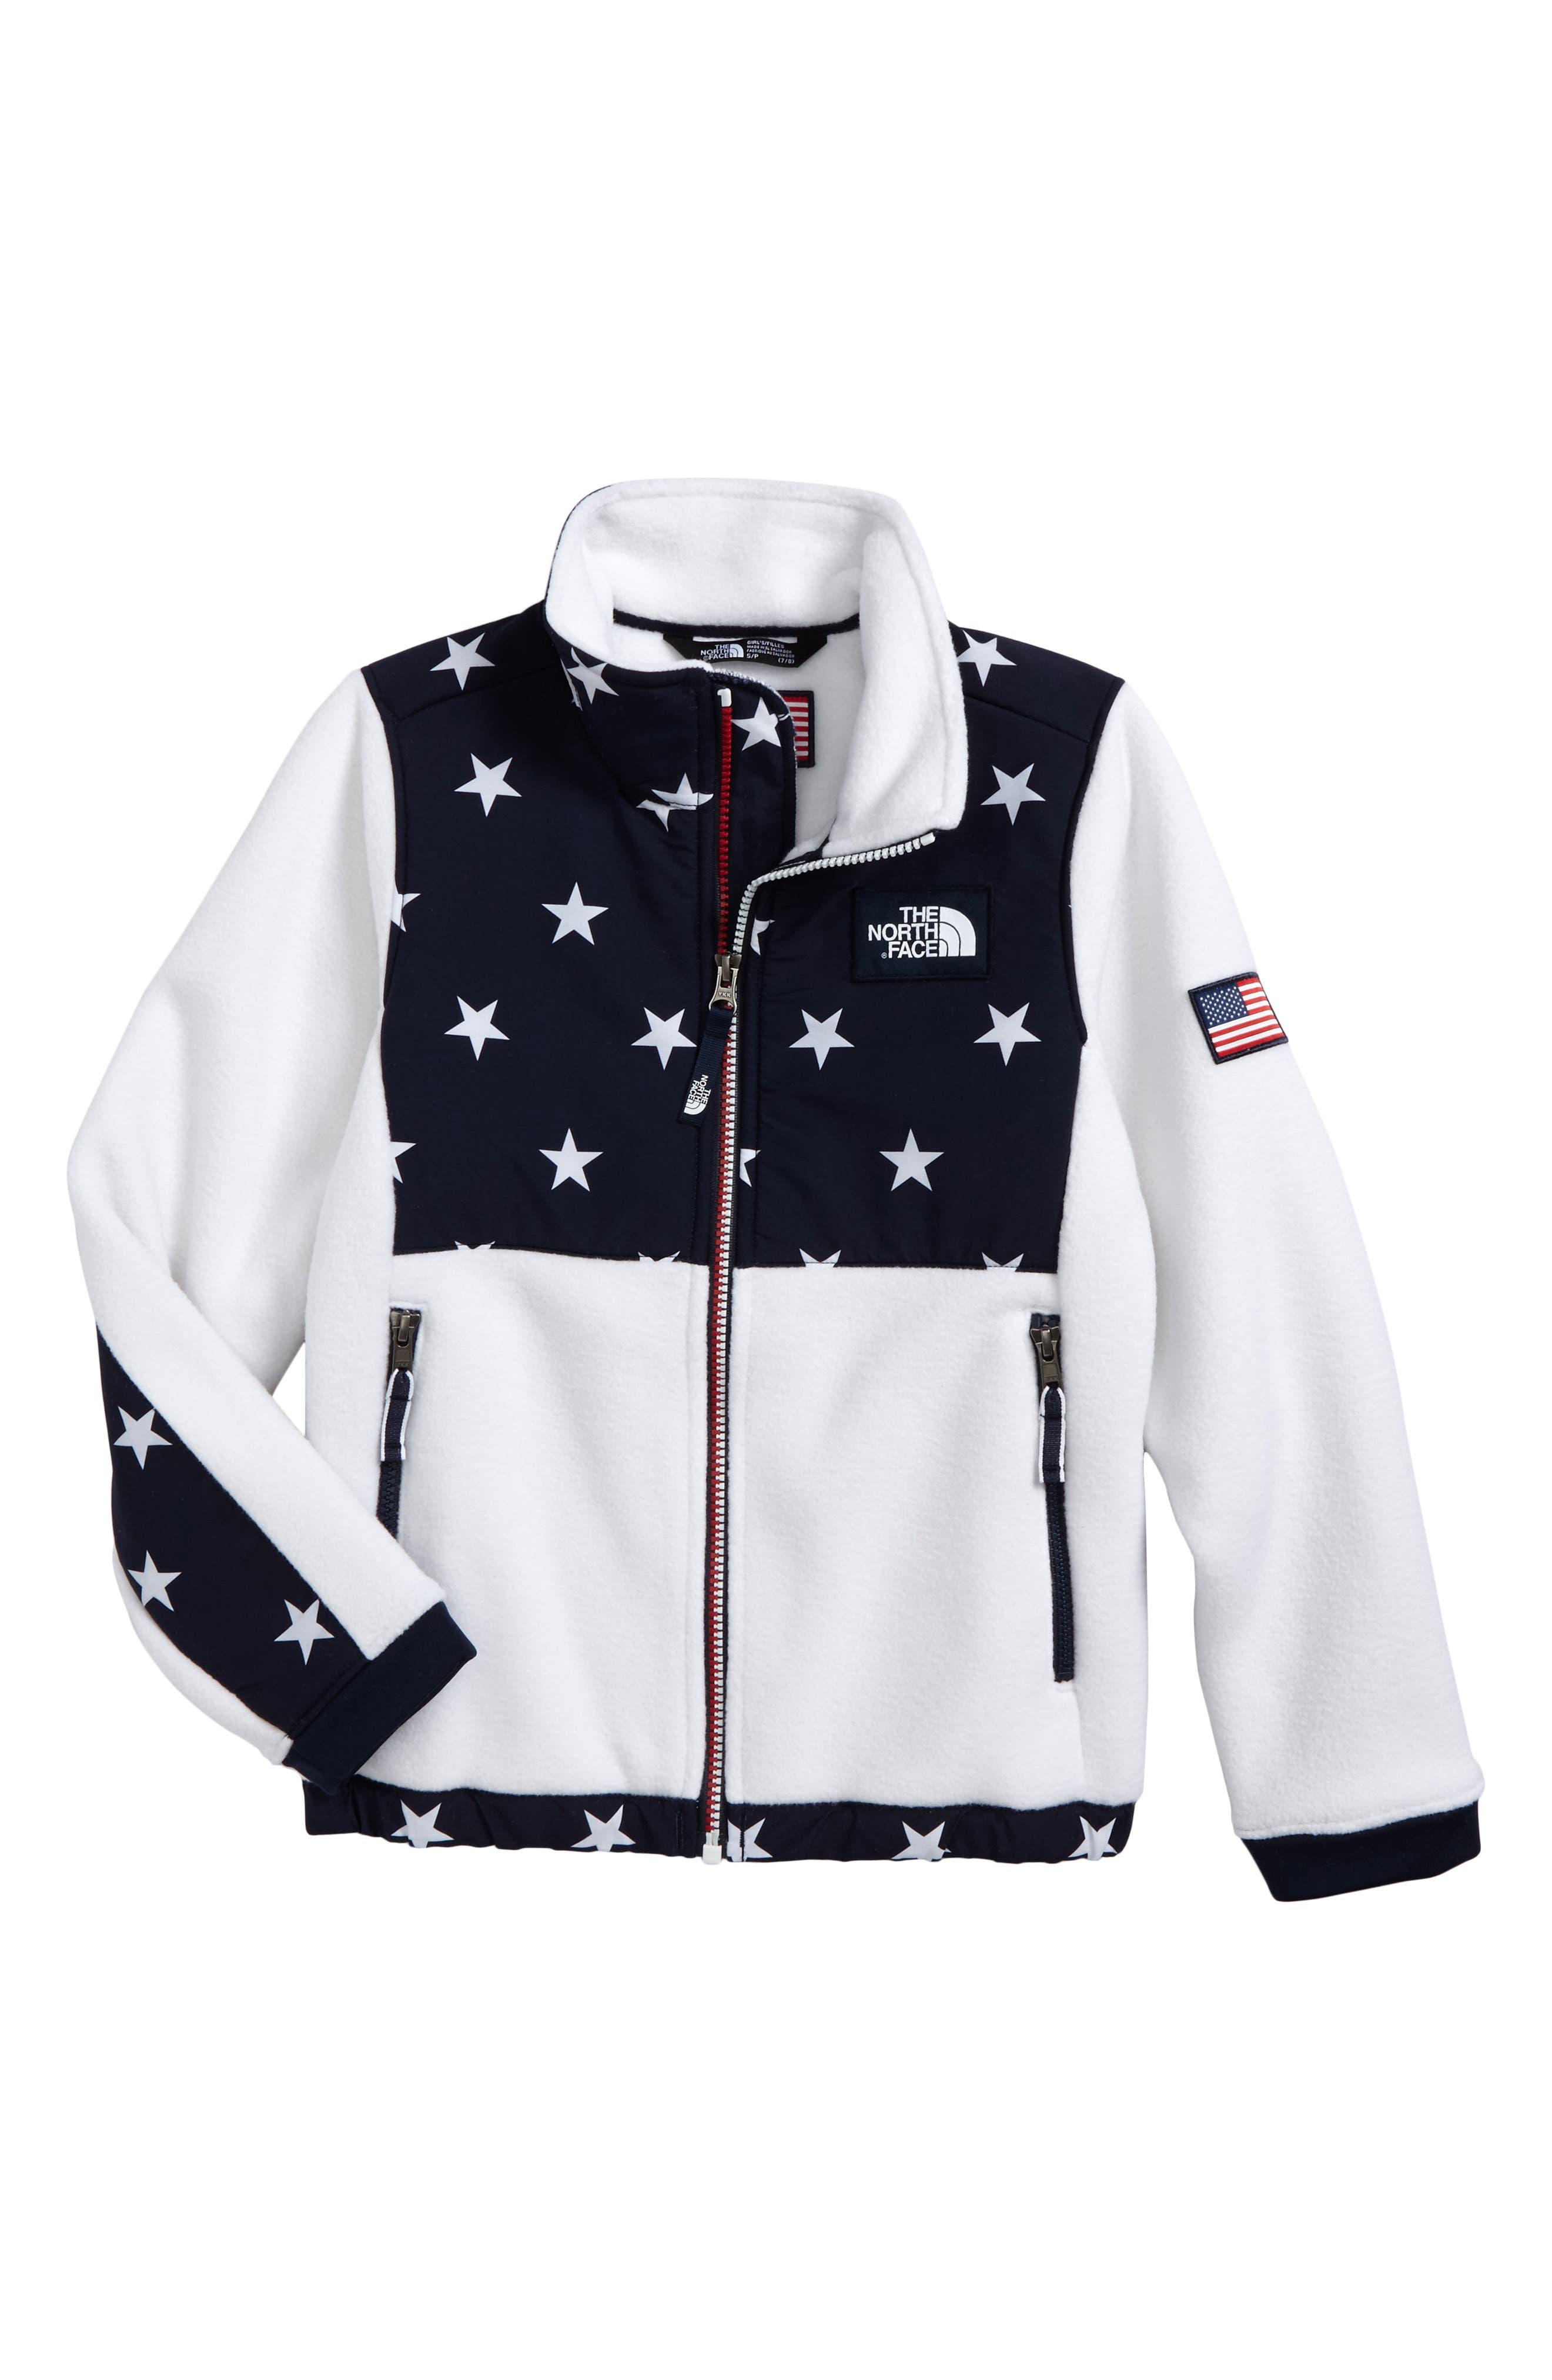 Denali Recycled Fleece Jacket,                         Main,                         color, 100